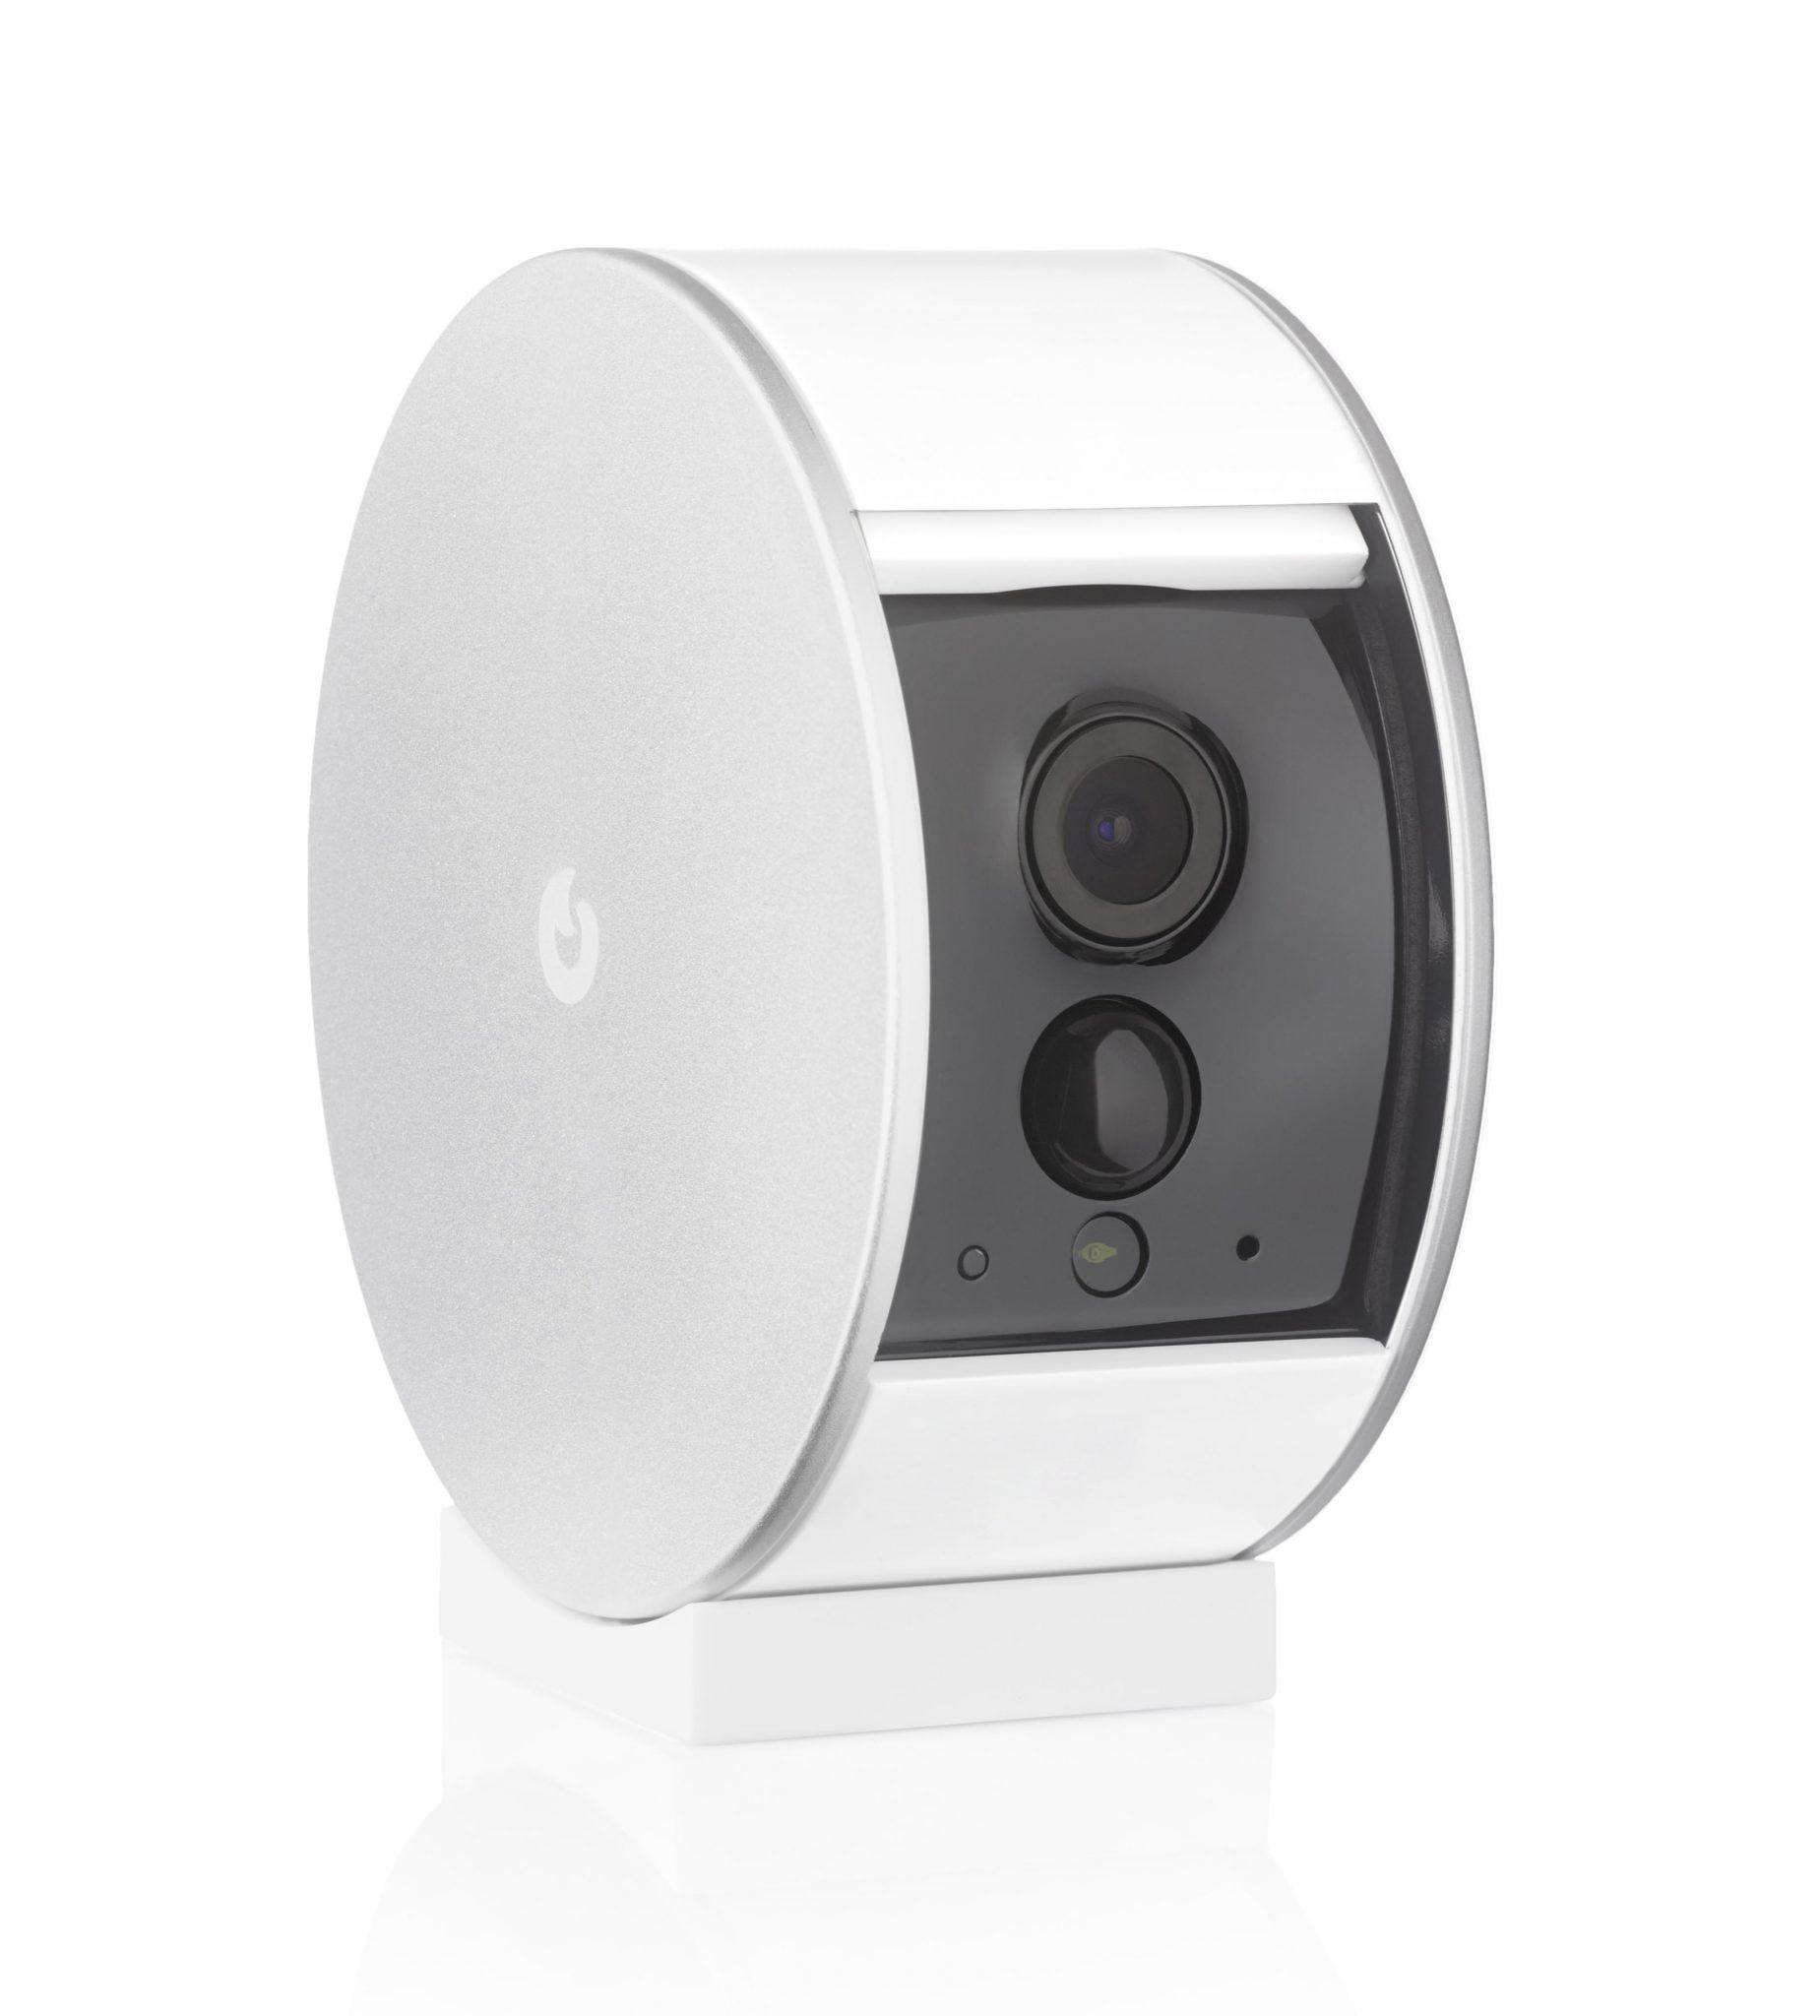 myfox security camera 1 socialandtech. Black Bedroom Furniture Sets. Home Design Ideas